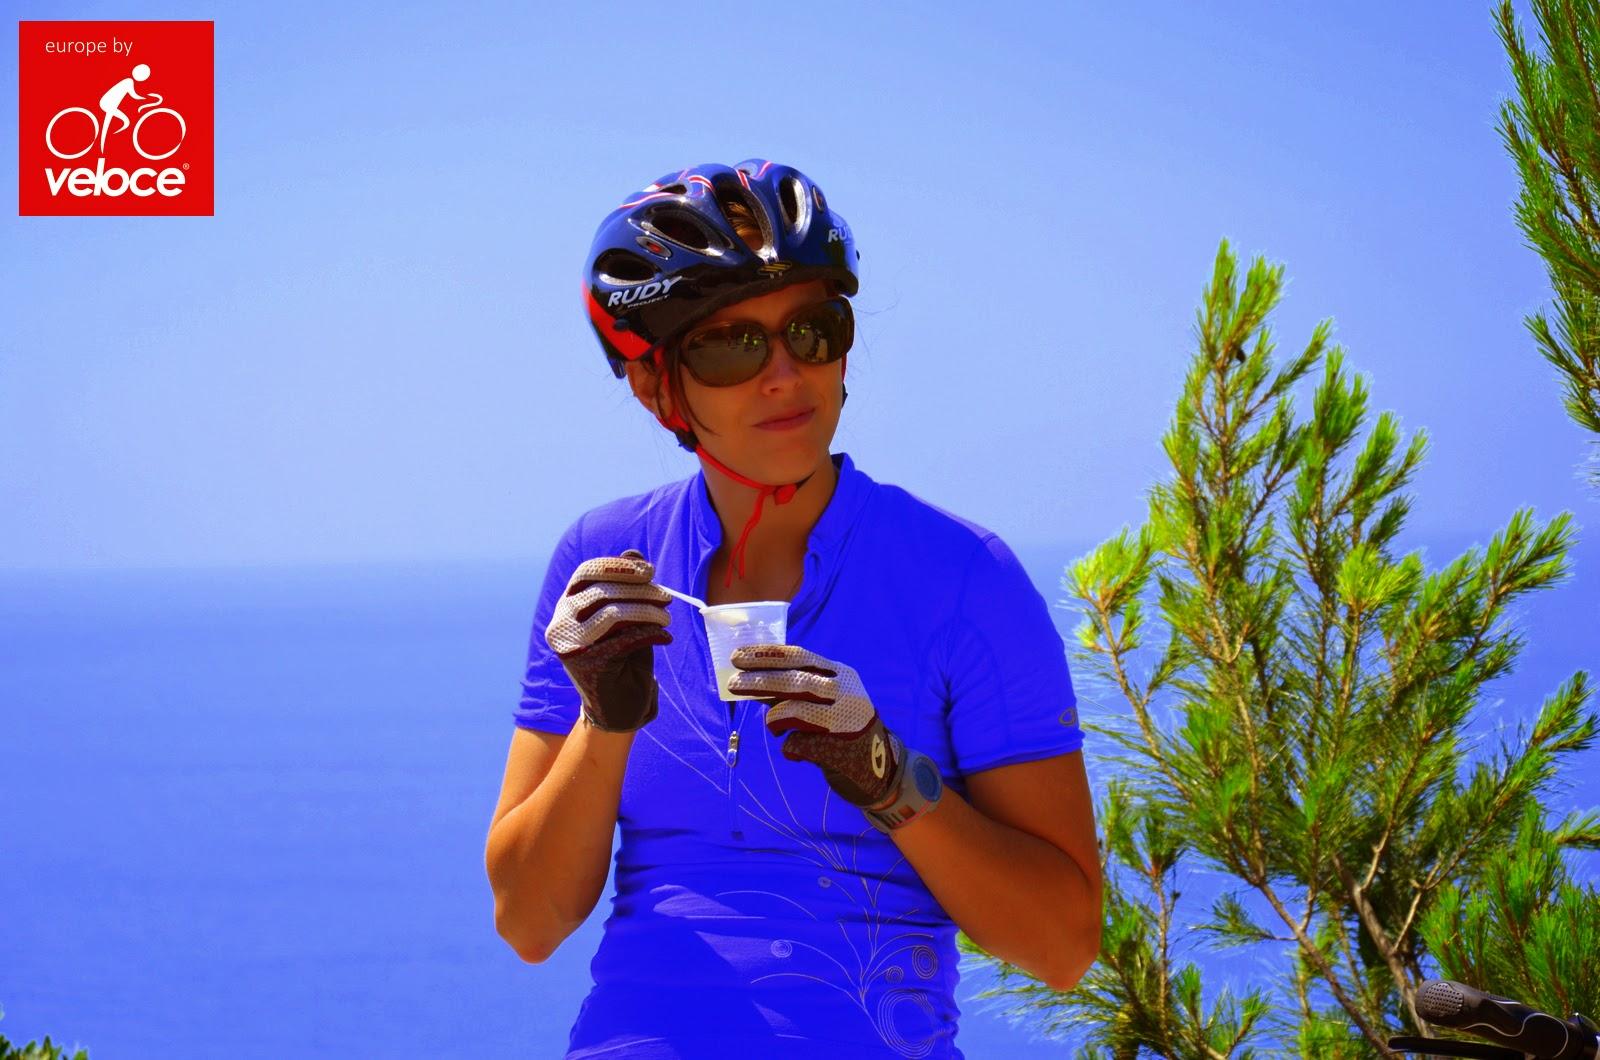 bike rental napoli sorrento amalfi coast